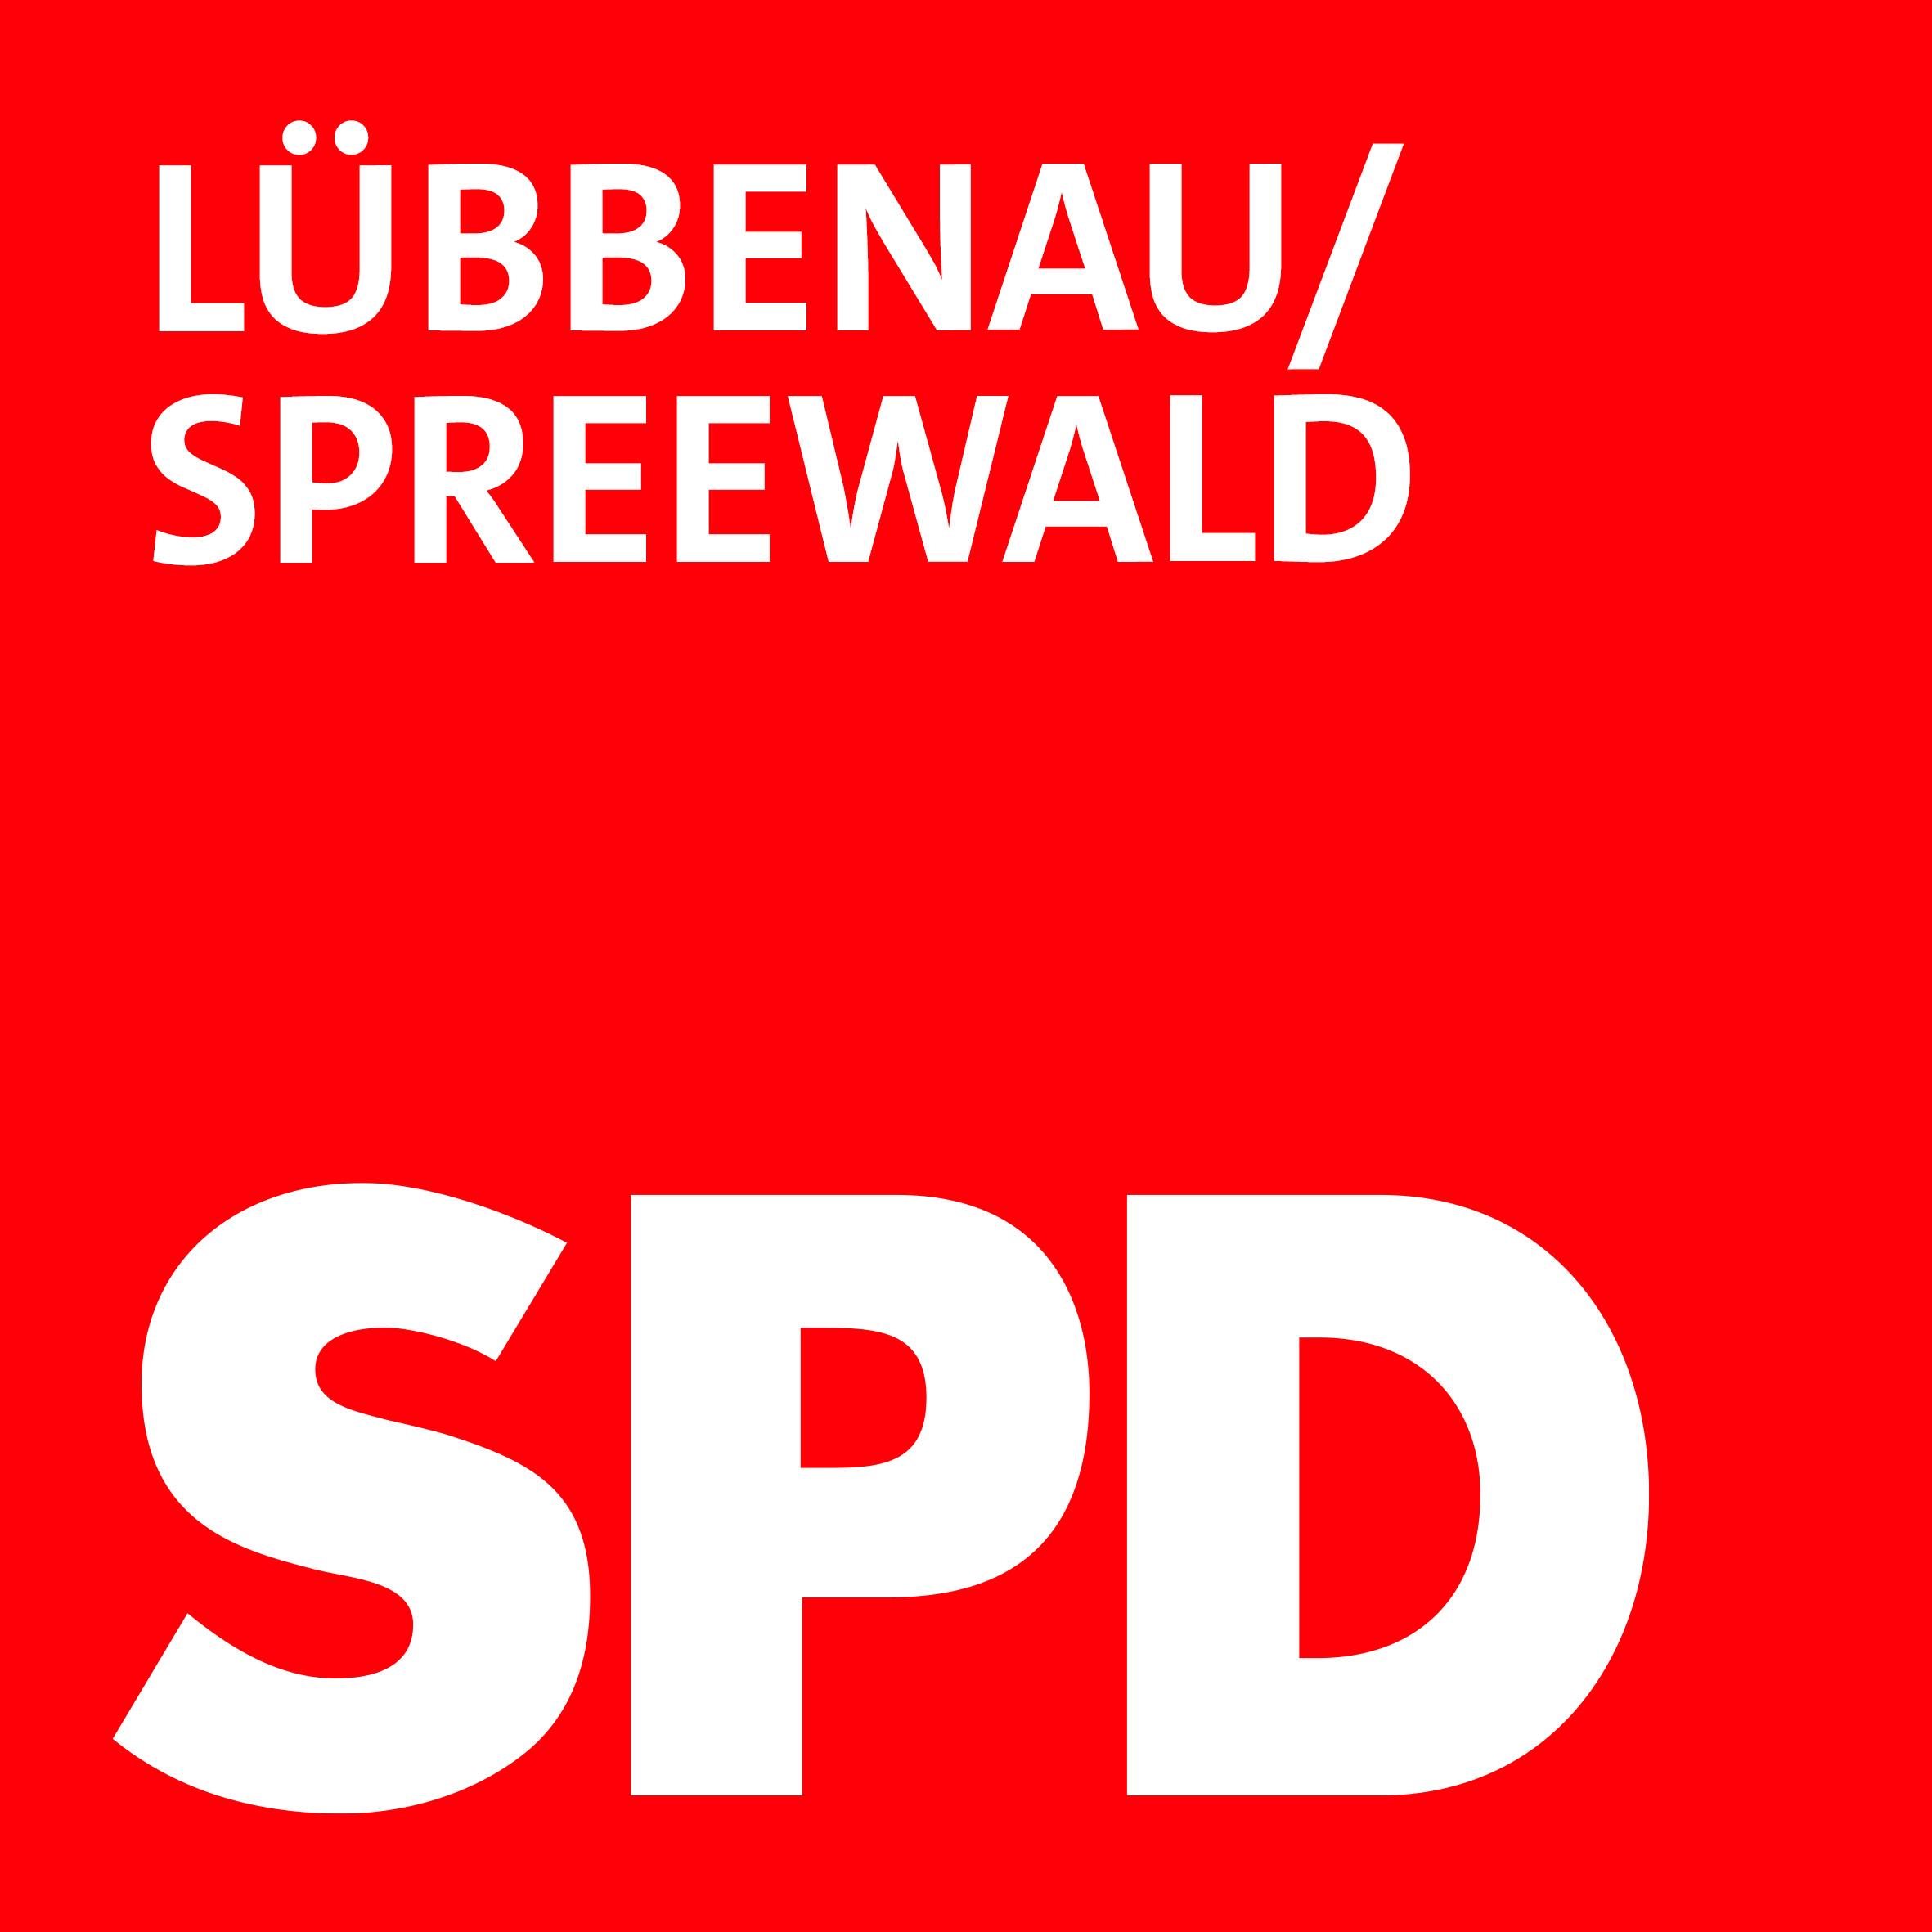 SPD Lübbenau/Spreewald